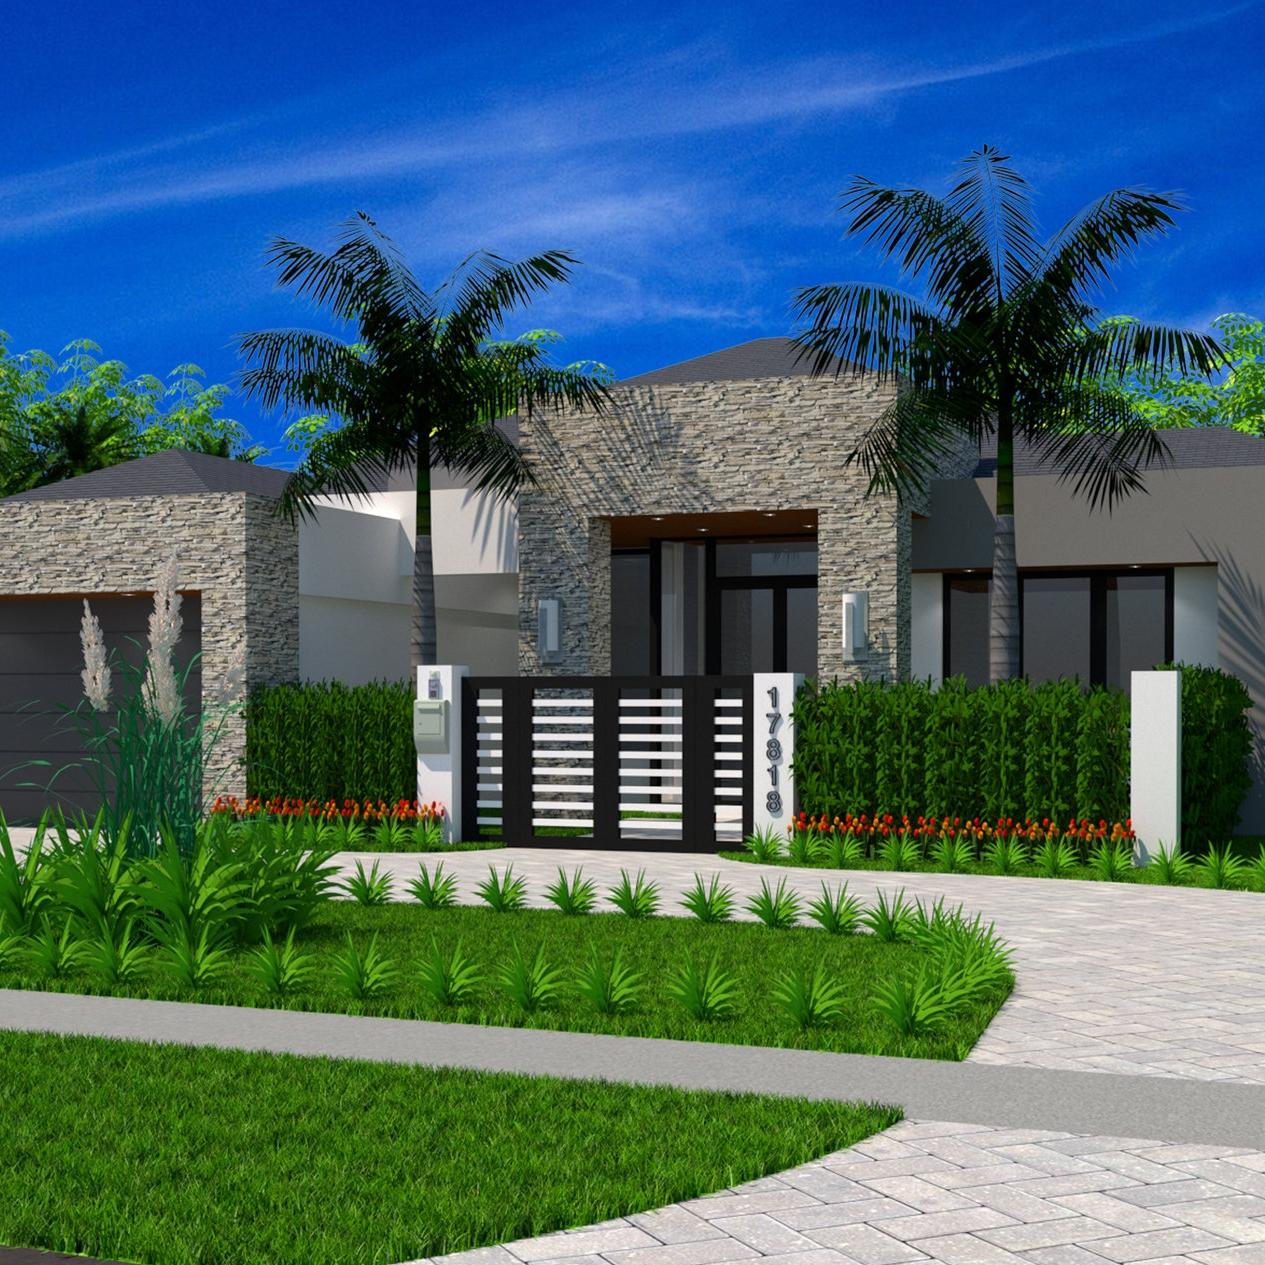 modern-home-florida-architecture.jpg